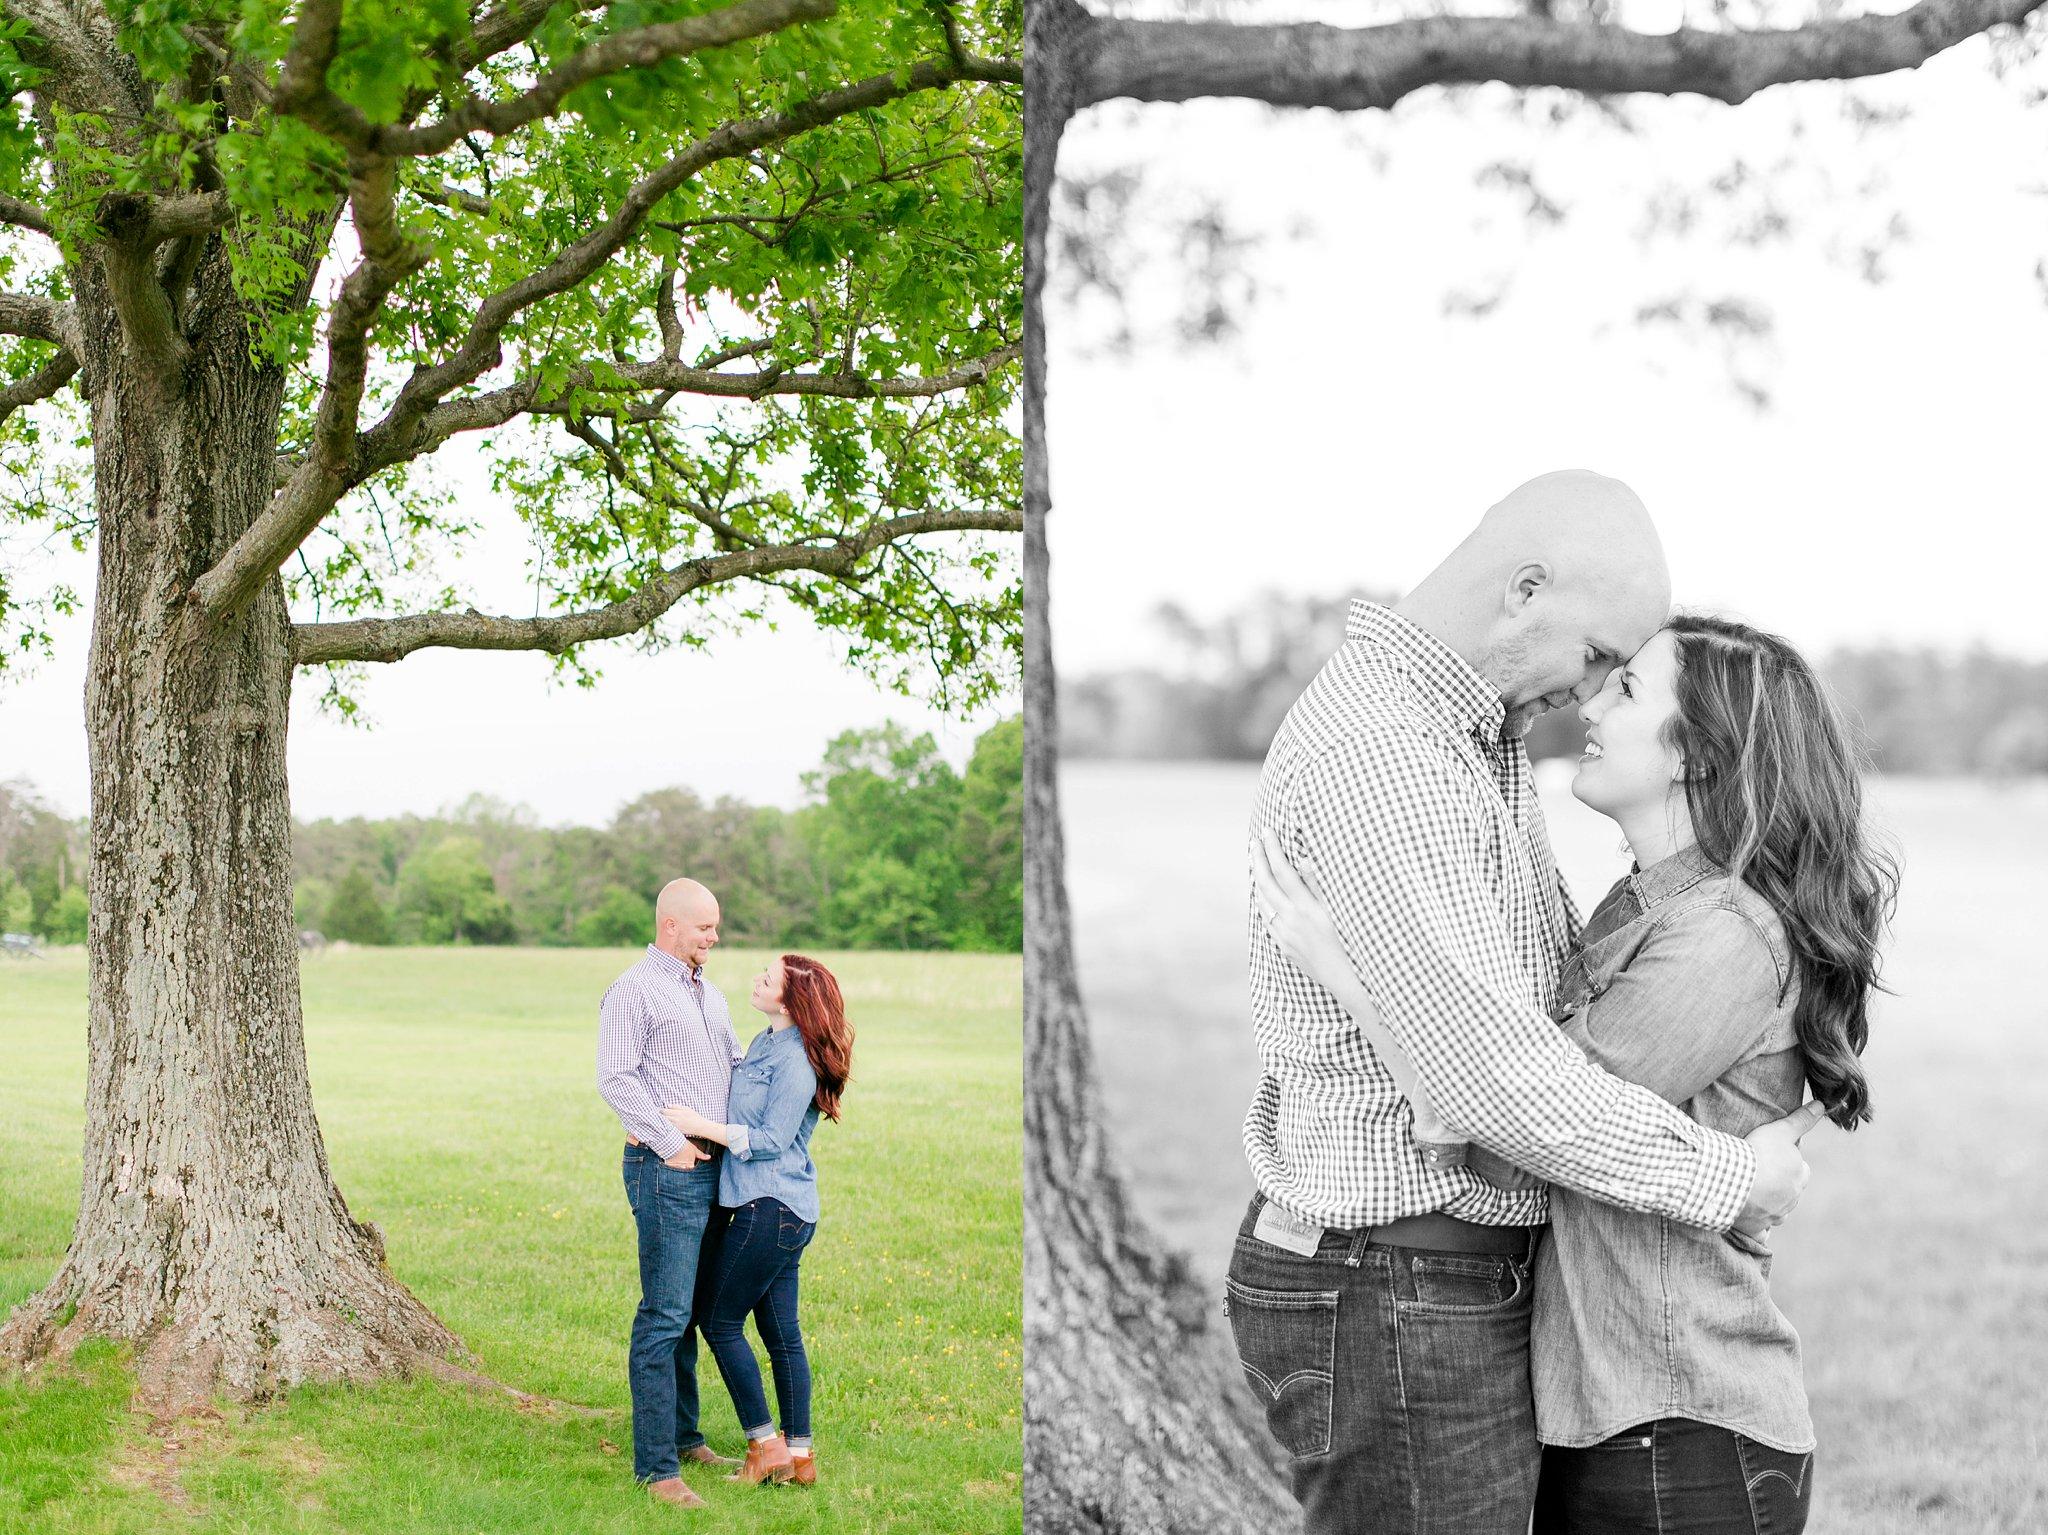 Old Town Manassas Battlefield Engagement Photos Virginia Wedding Photographer Jessica & Jason-174.jpg